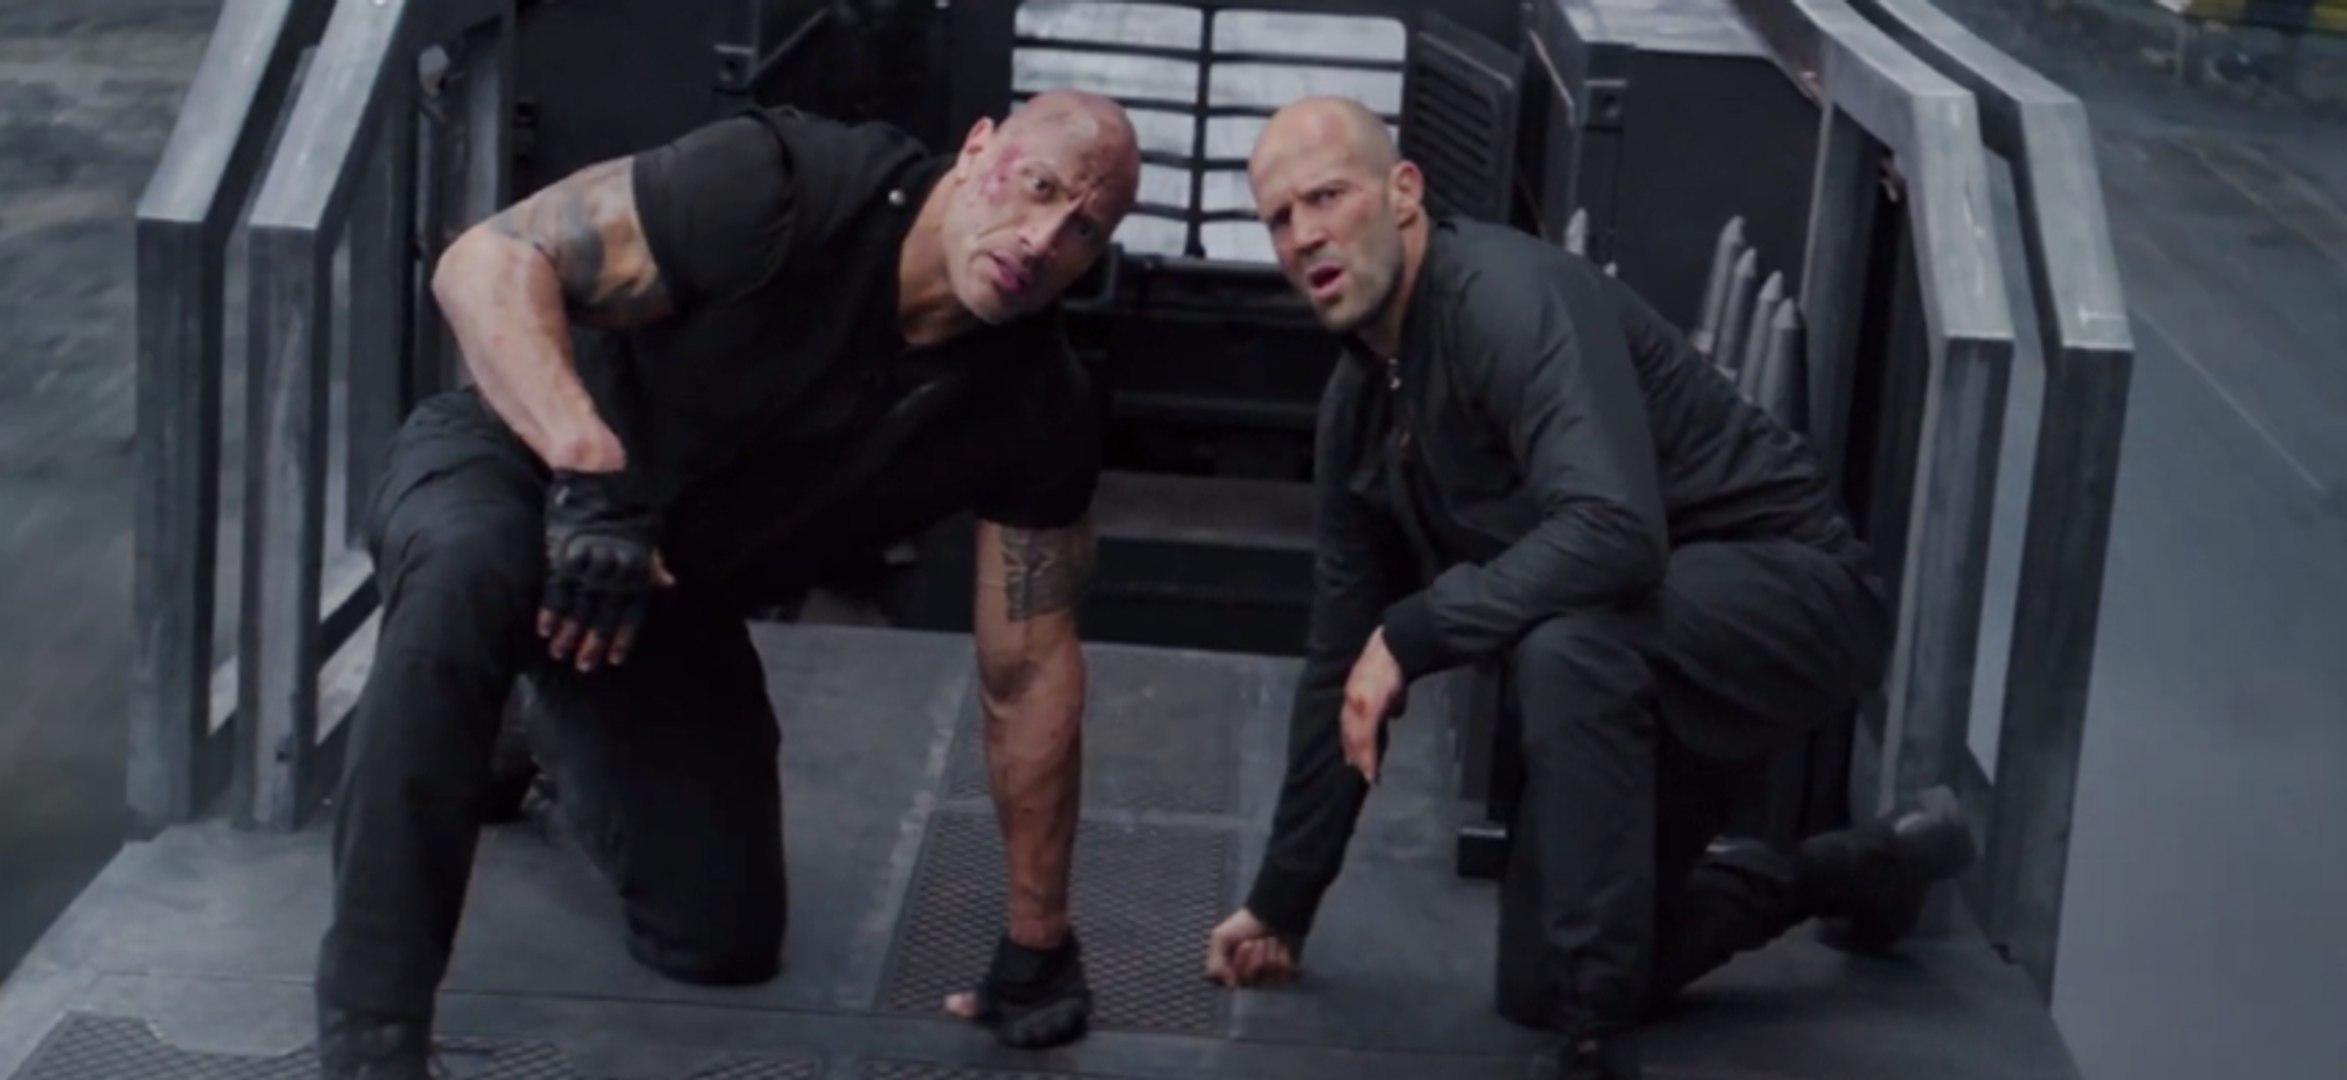 Hobbs & Shaw - Nuevo tráiler del spin-off de Fast & Furious (inglés)